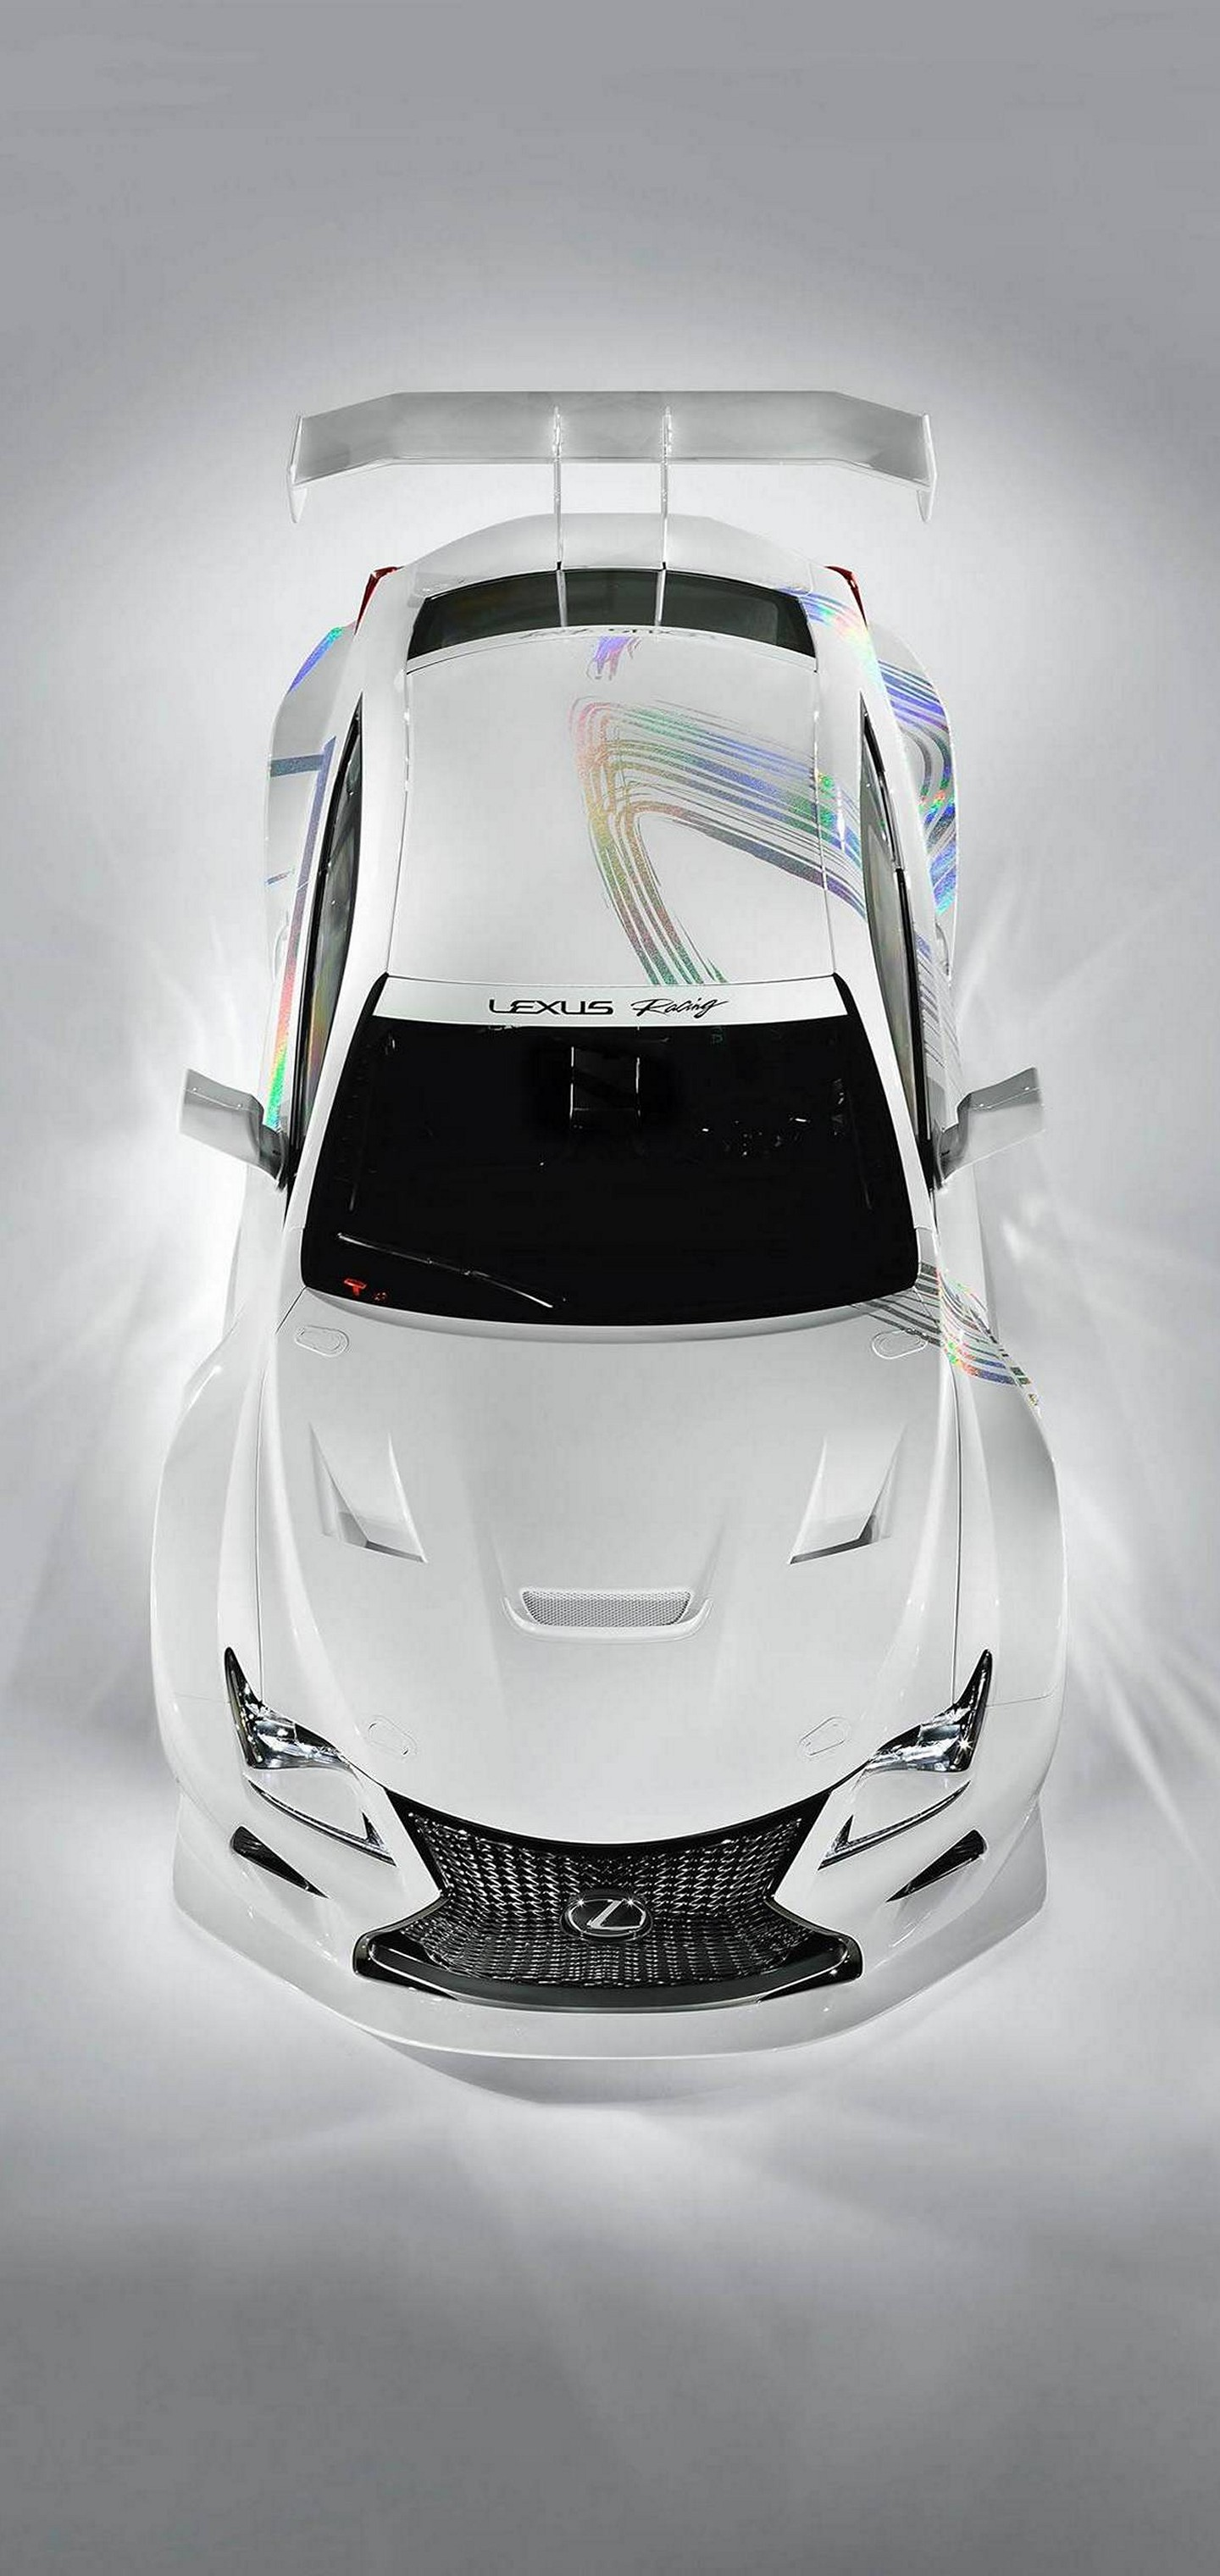 White Car Lexus Wallpaper Samsung A70 Wallpaper Car Hd 3119192 Hd Wallpaper Backgrounds Download